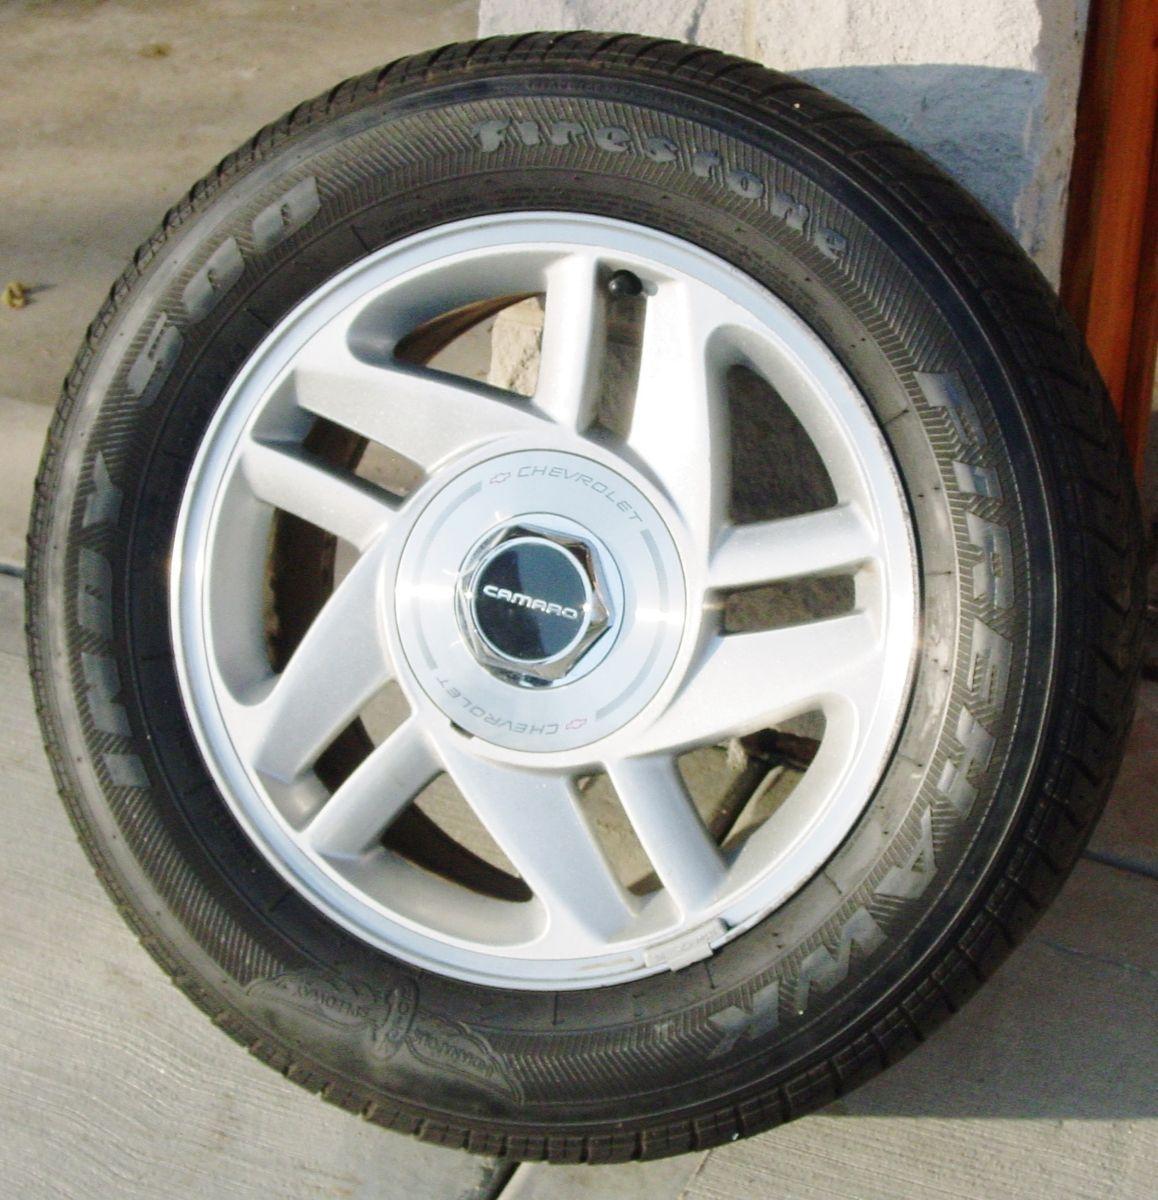 SET of 4 93 96 Chevrolet Camaro OEM 16x8 Wheels Tires 5 Double Spoke